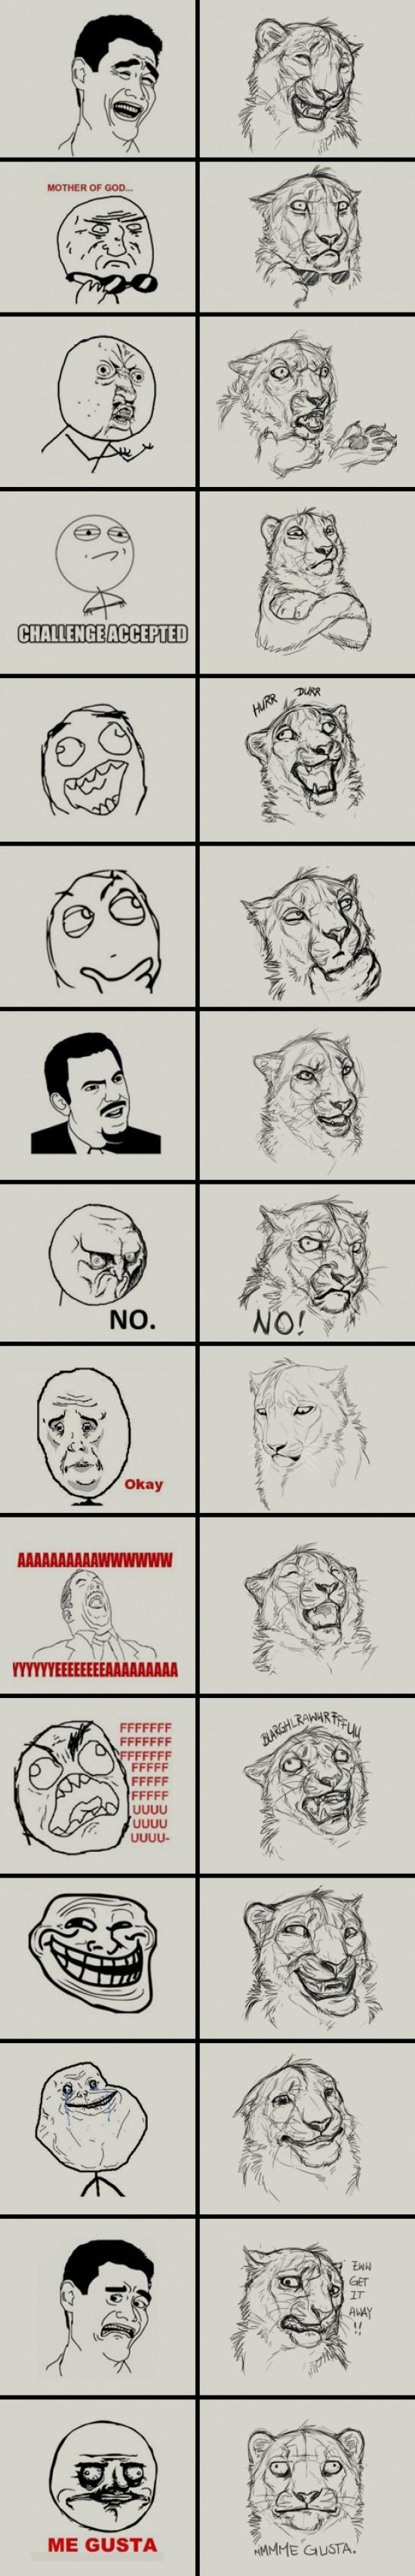 leon,memes,momos,paoming,rage faces,trollfeis